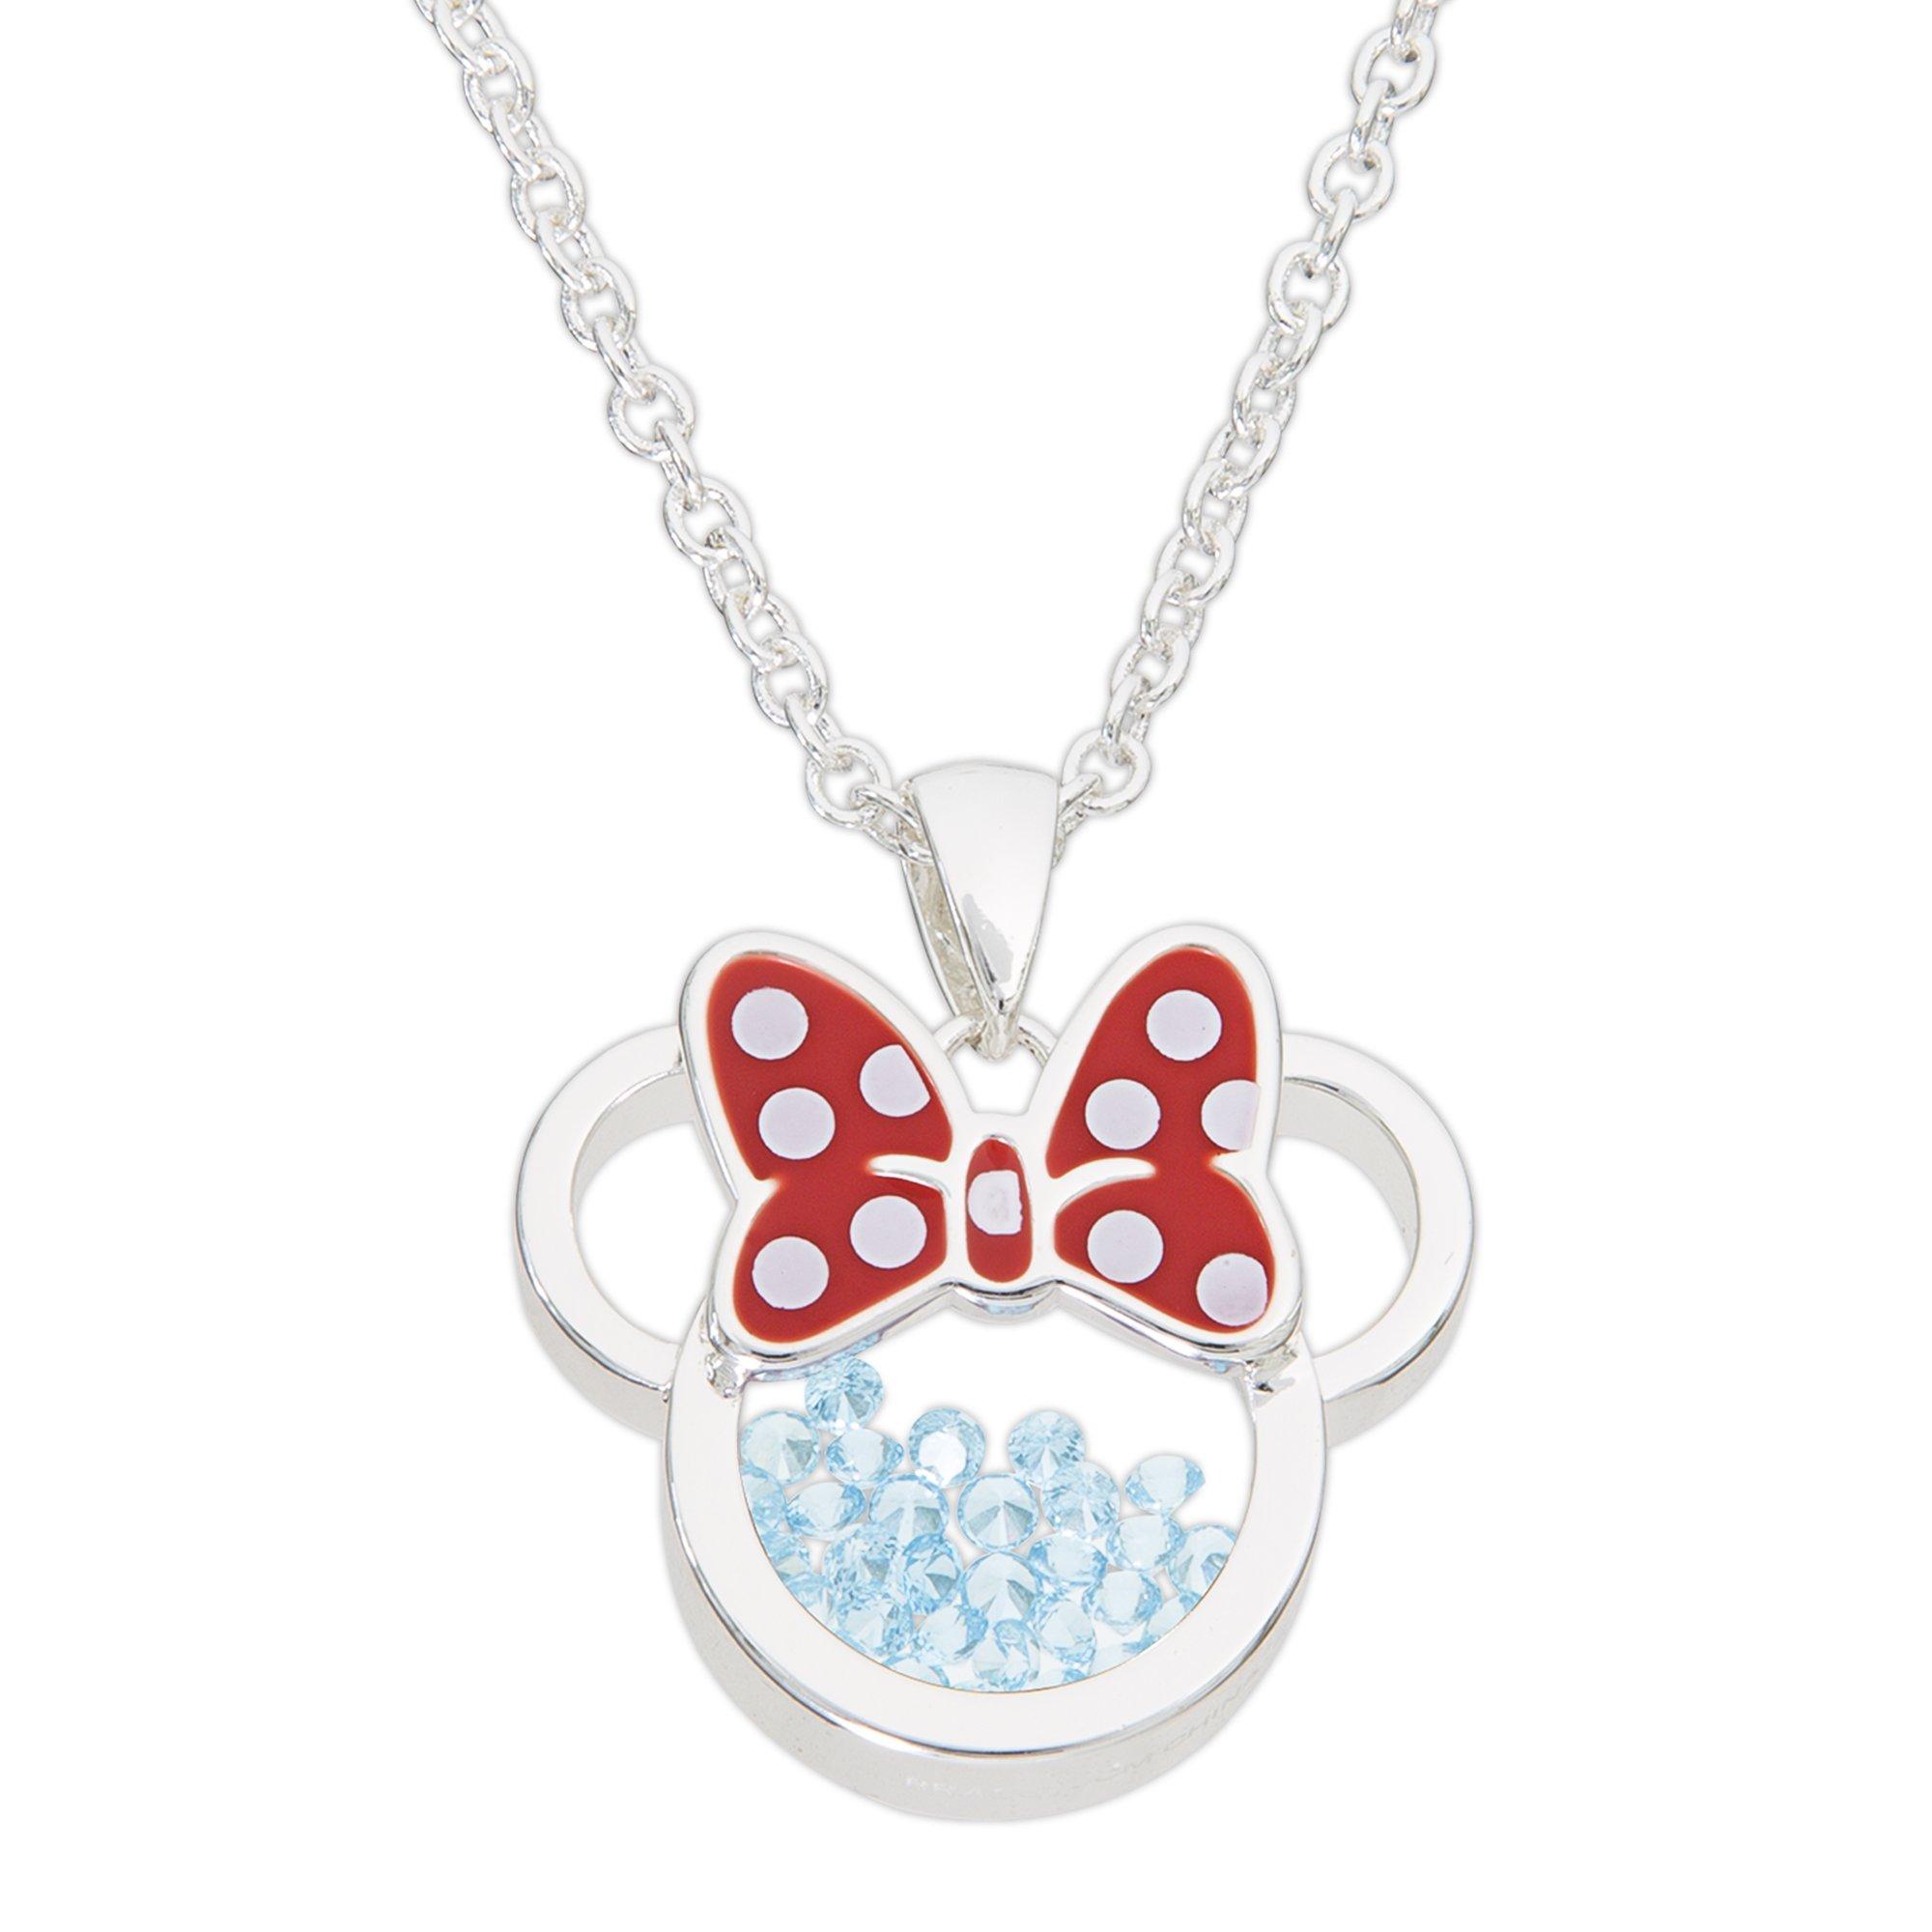 Disney Birthstone Women and Girls Jewelry Minnie Mouse Silver Plated March Aquamarine Light Blue Swarovski Cubic Zirconia Shaker Pendant Necklace, 18+2'' Extender Mickey's 90th Birthday Anniversary